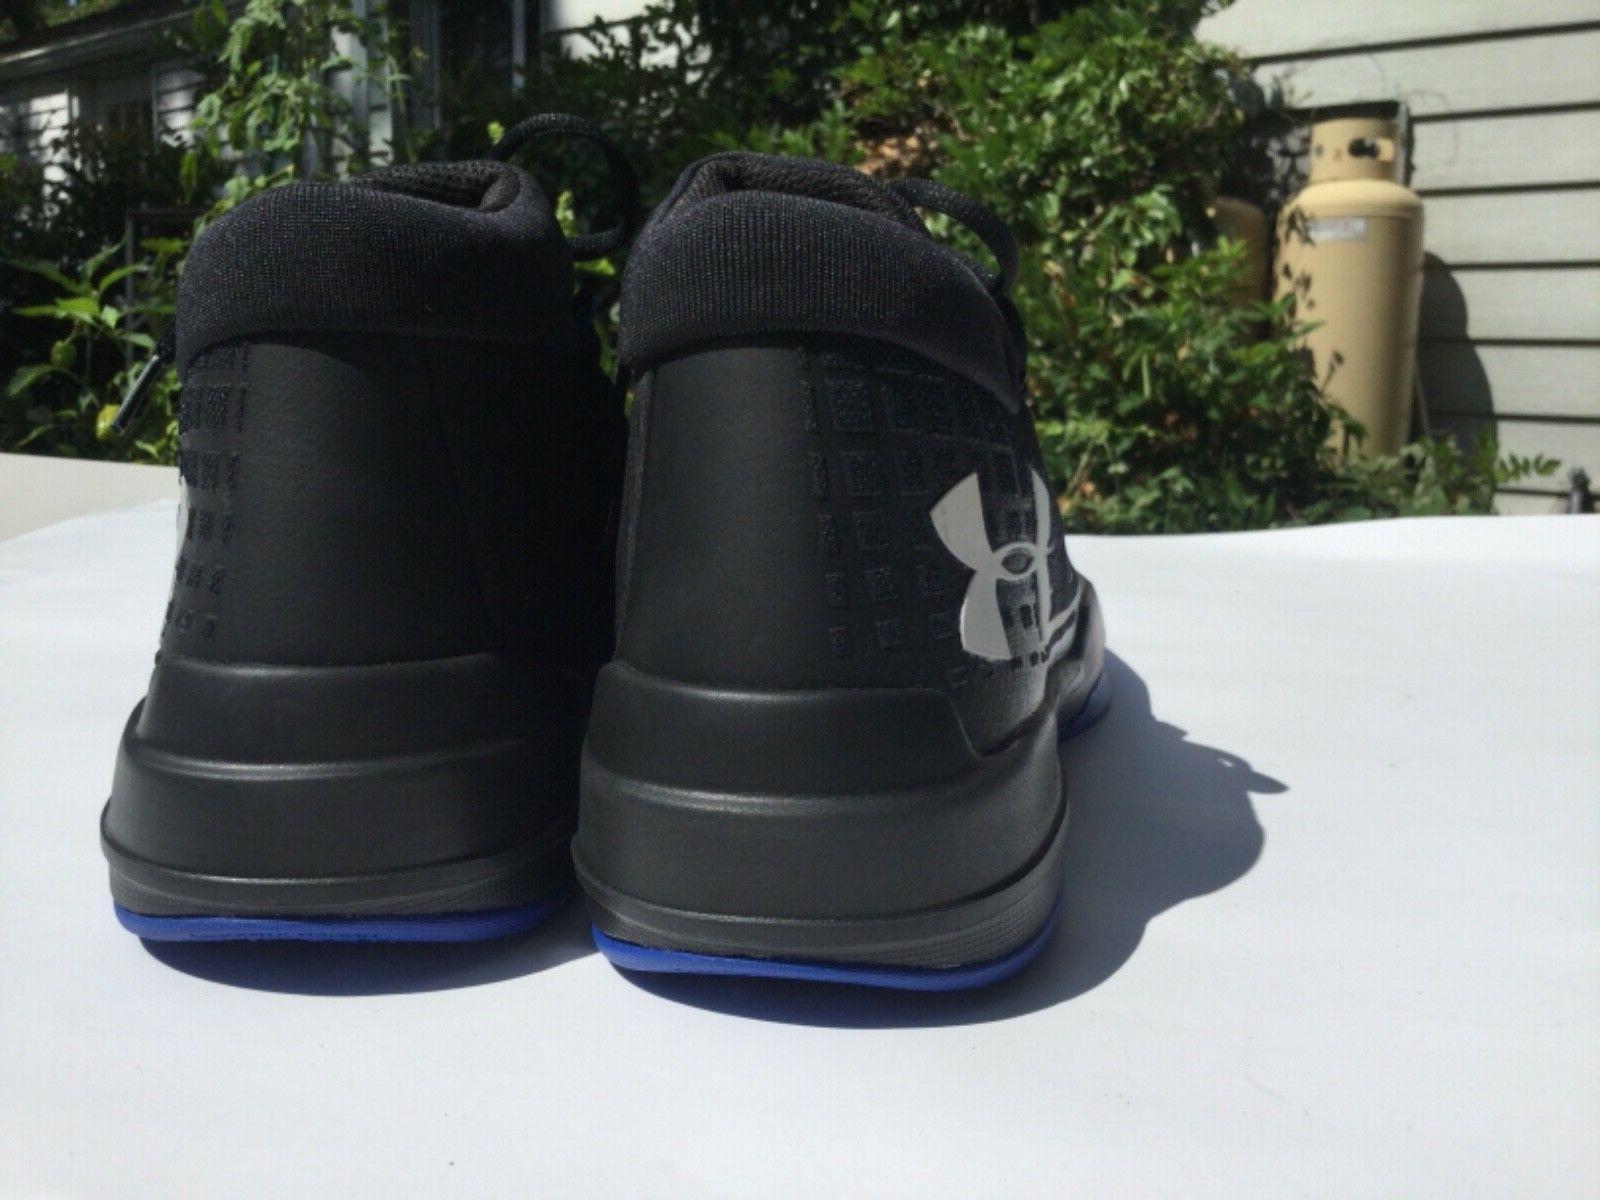 TB Basketball Shoe sneaker - Blue black 10.5